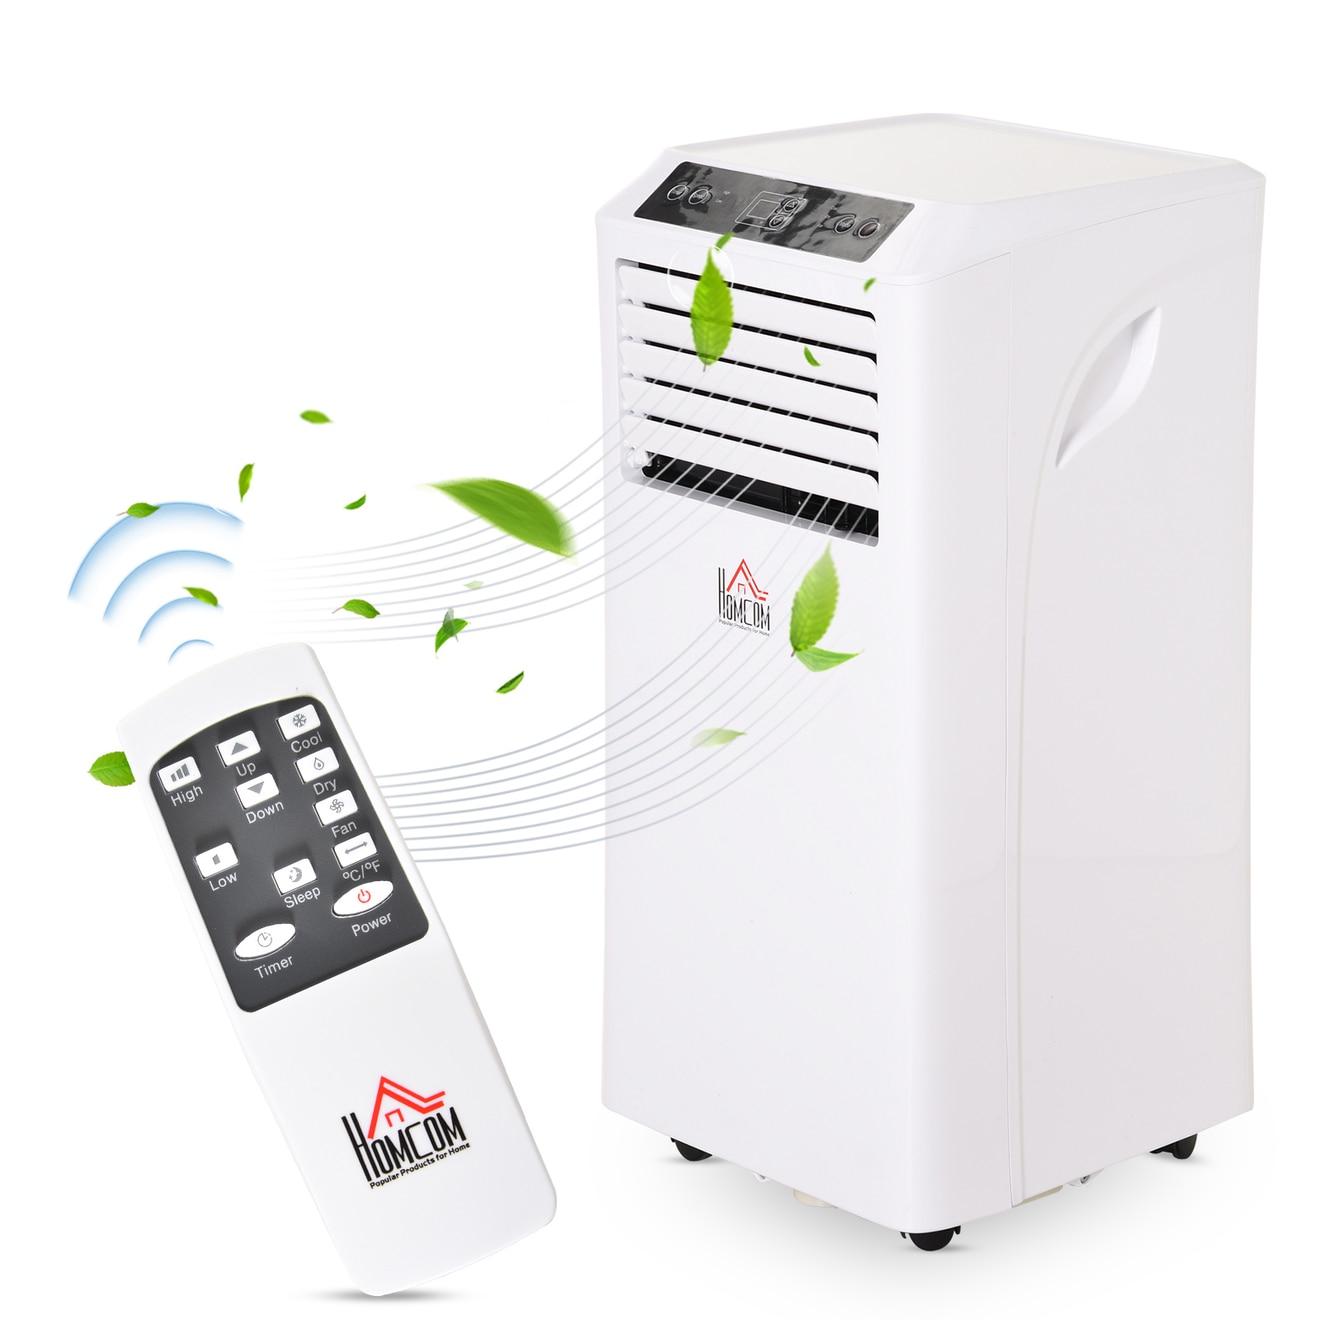 Homcom Mobile Klimaanlage (10.000 BTU bzw. 2900W Kühlleistung, inkl. Installationsmaterial & Fernbedienung)